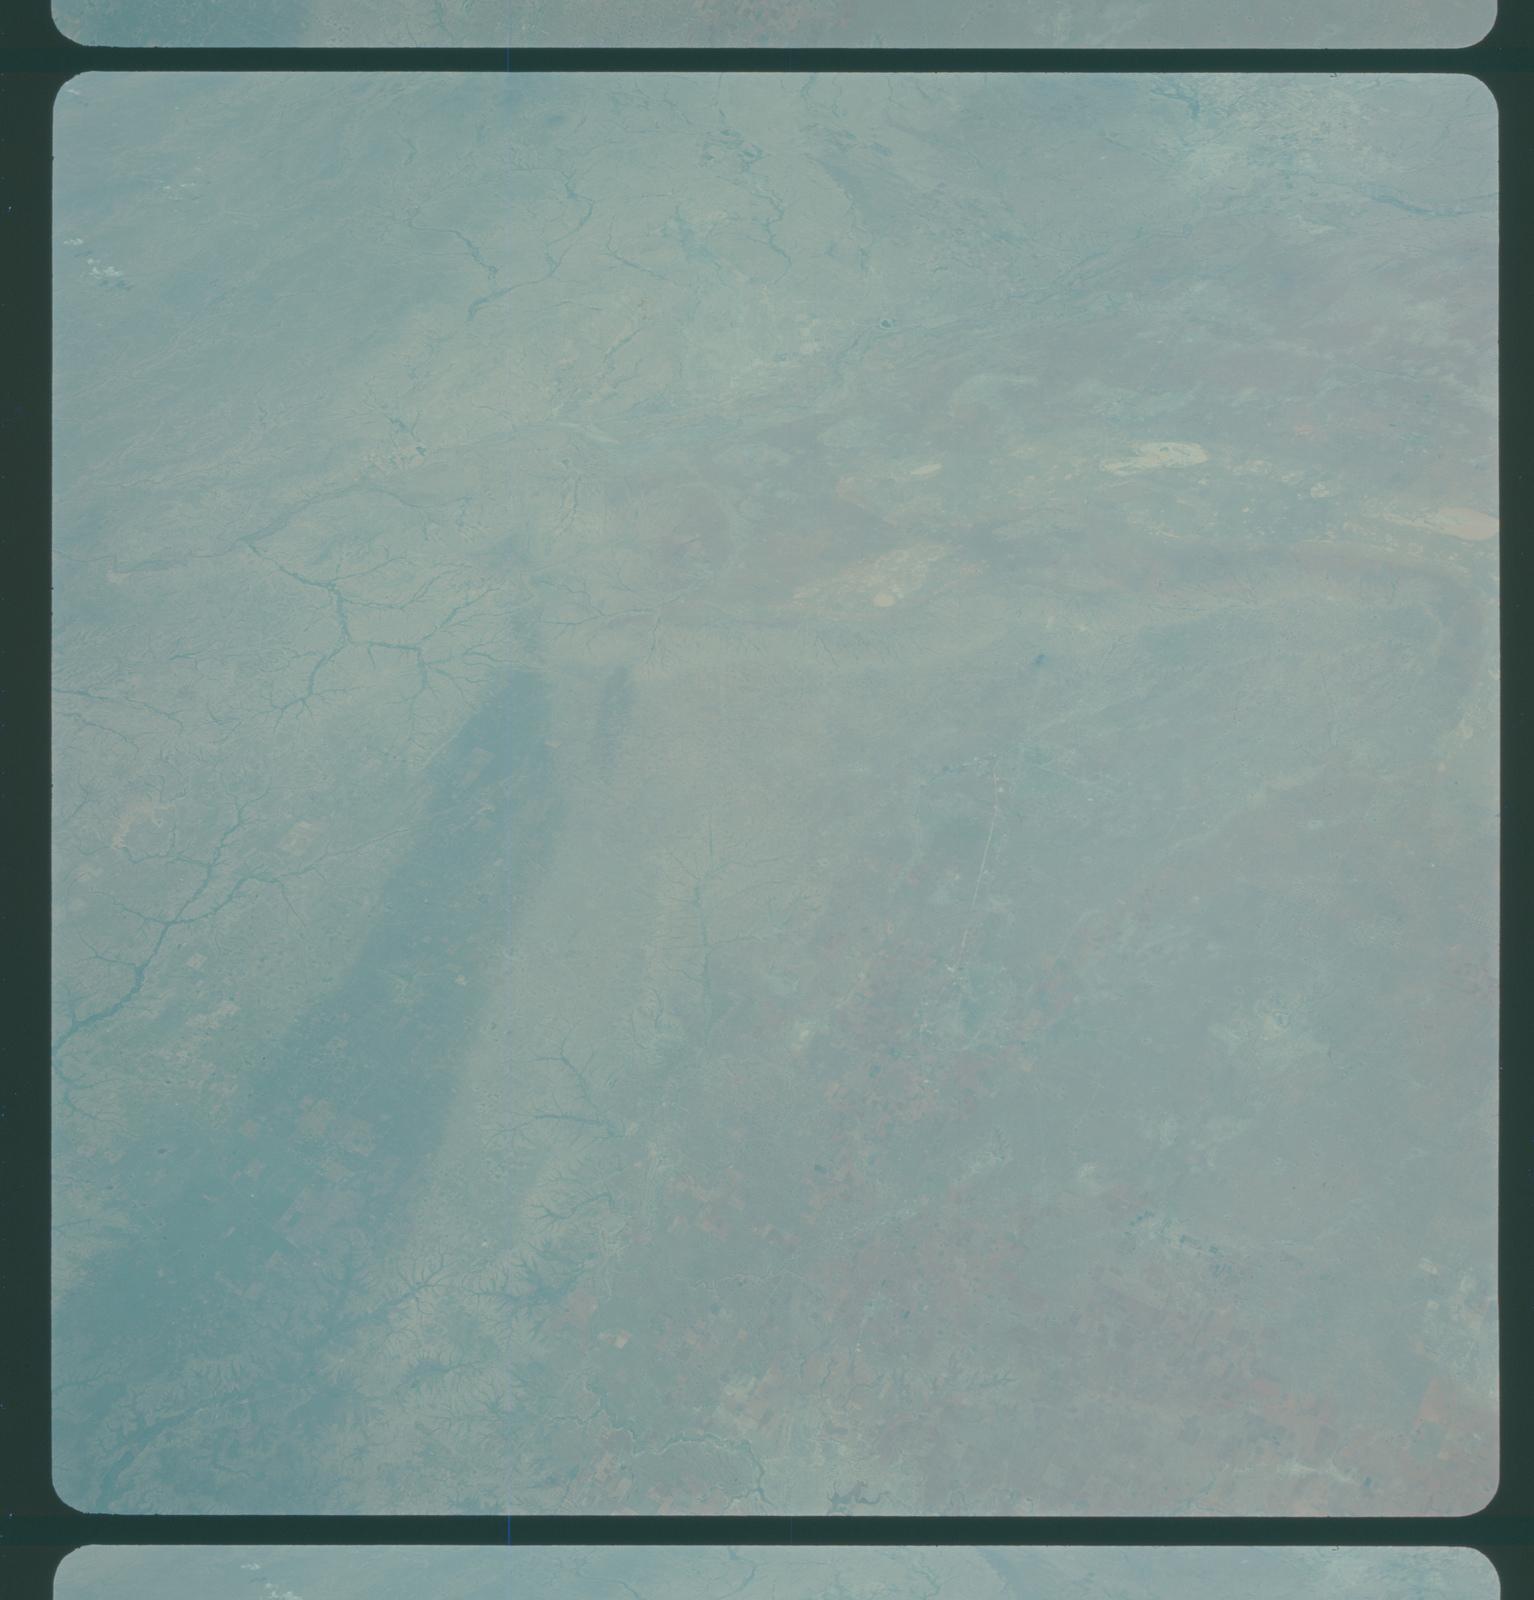 Gemini IV Mission Image -  Texas